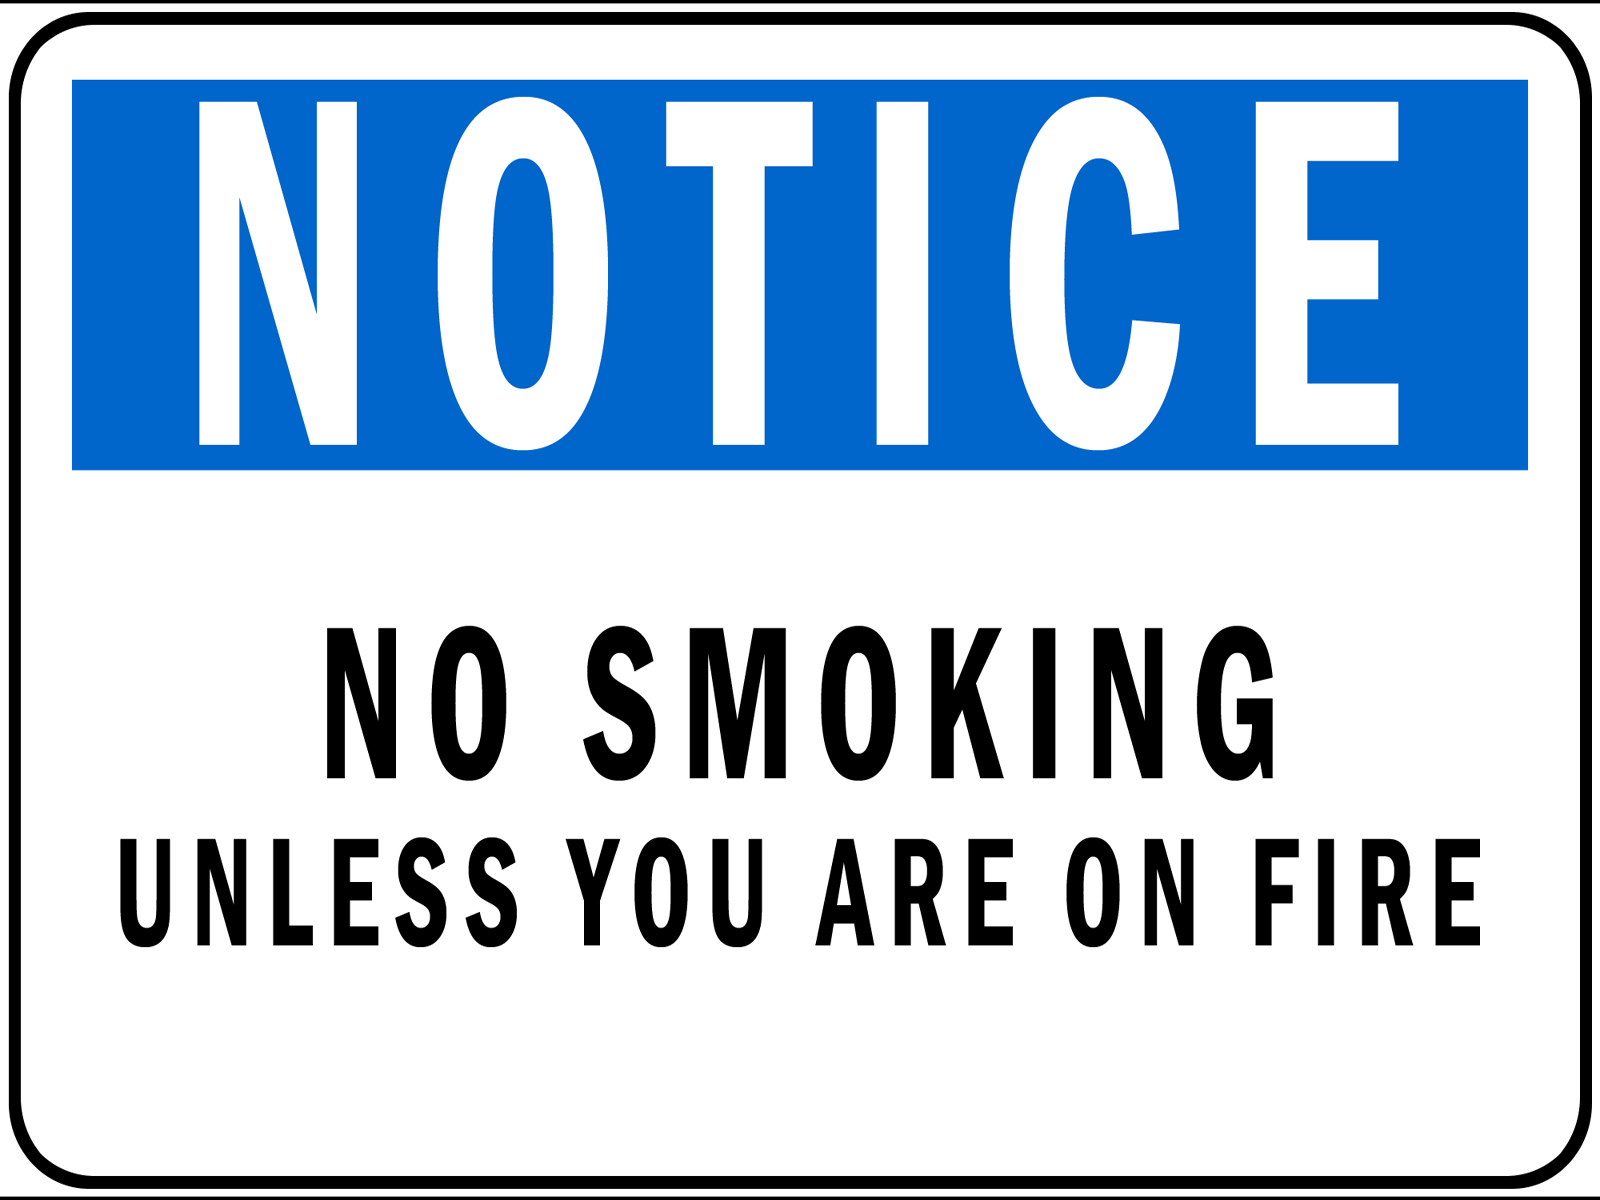 No Smoking Funny Wallpaper   Background Bandit 1600x1200